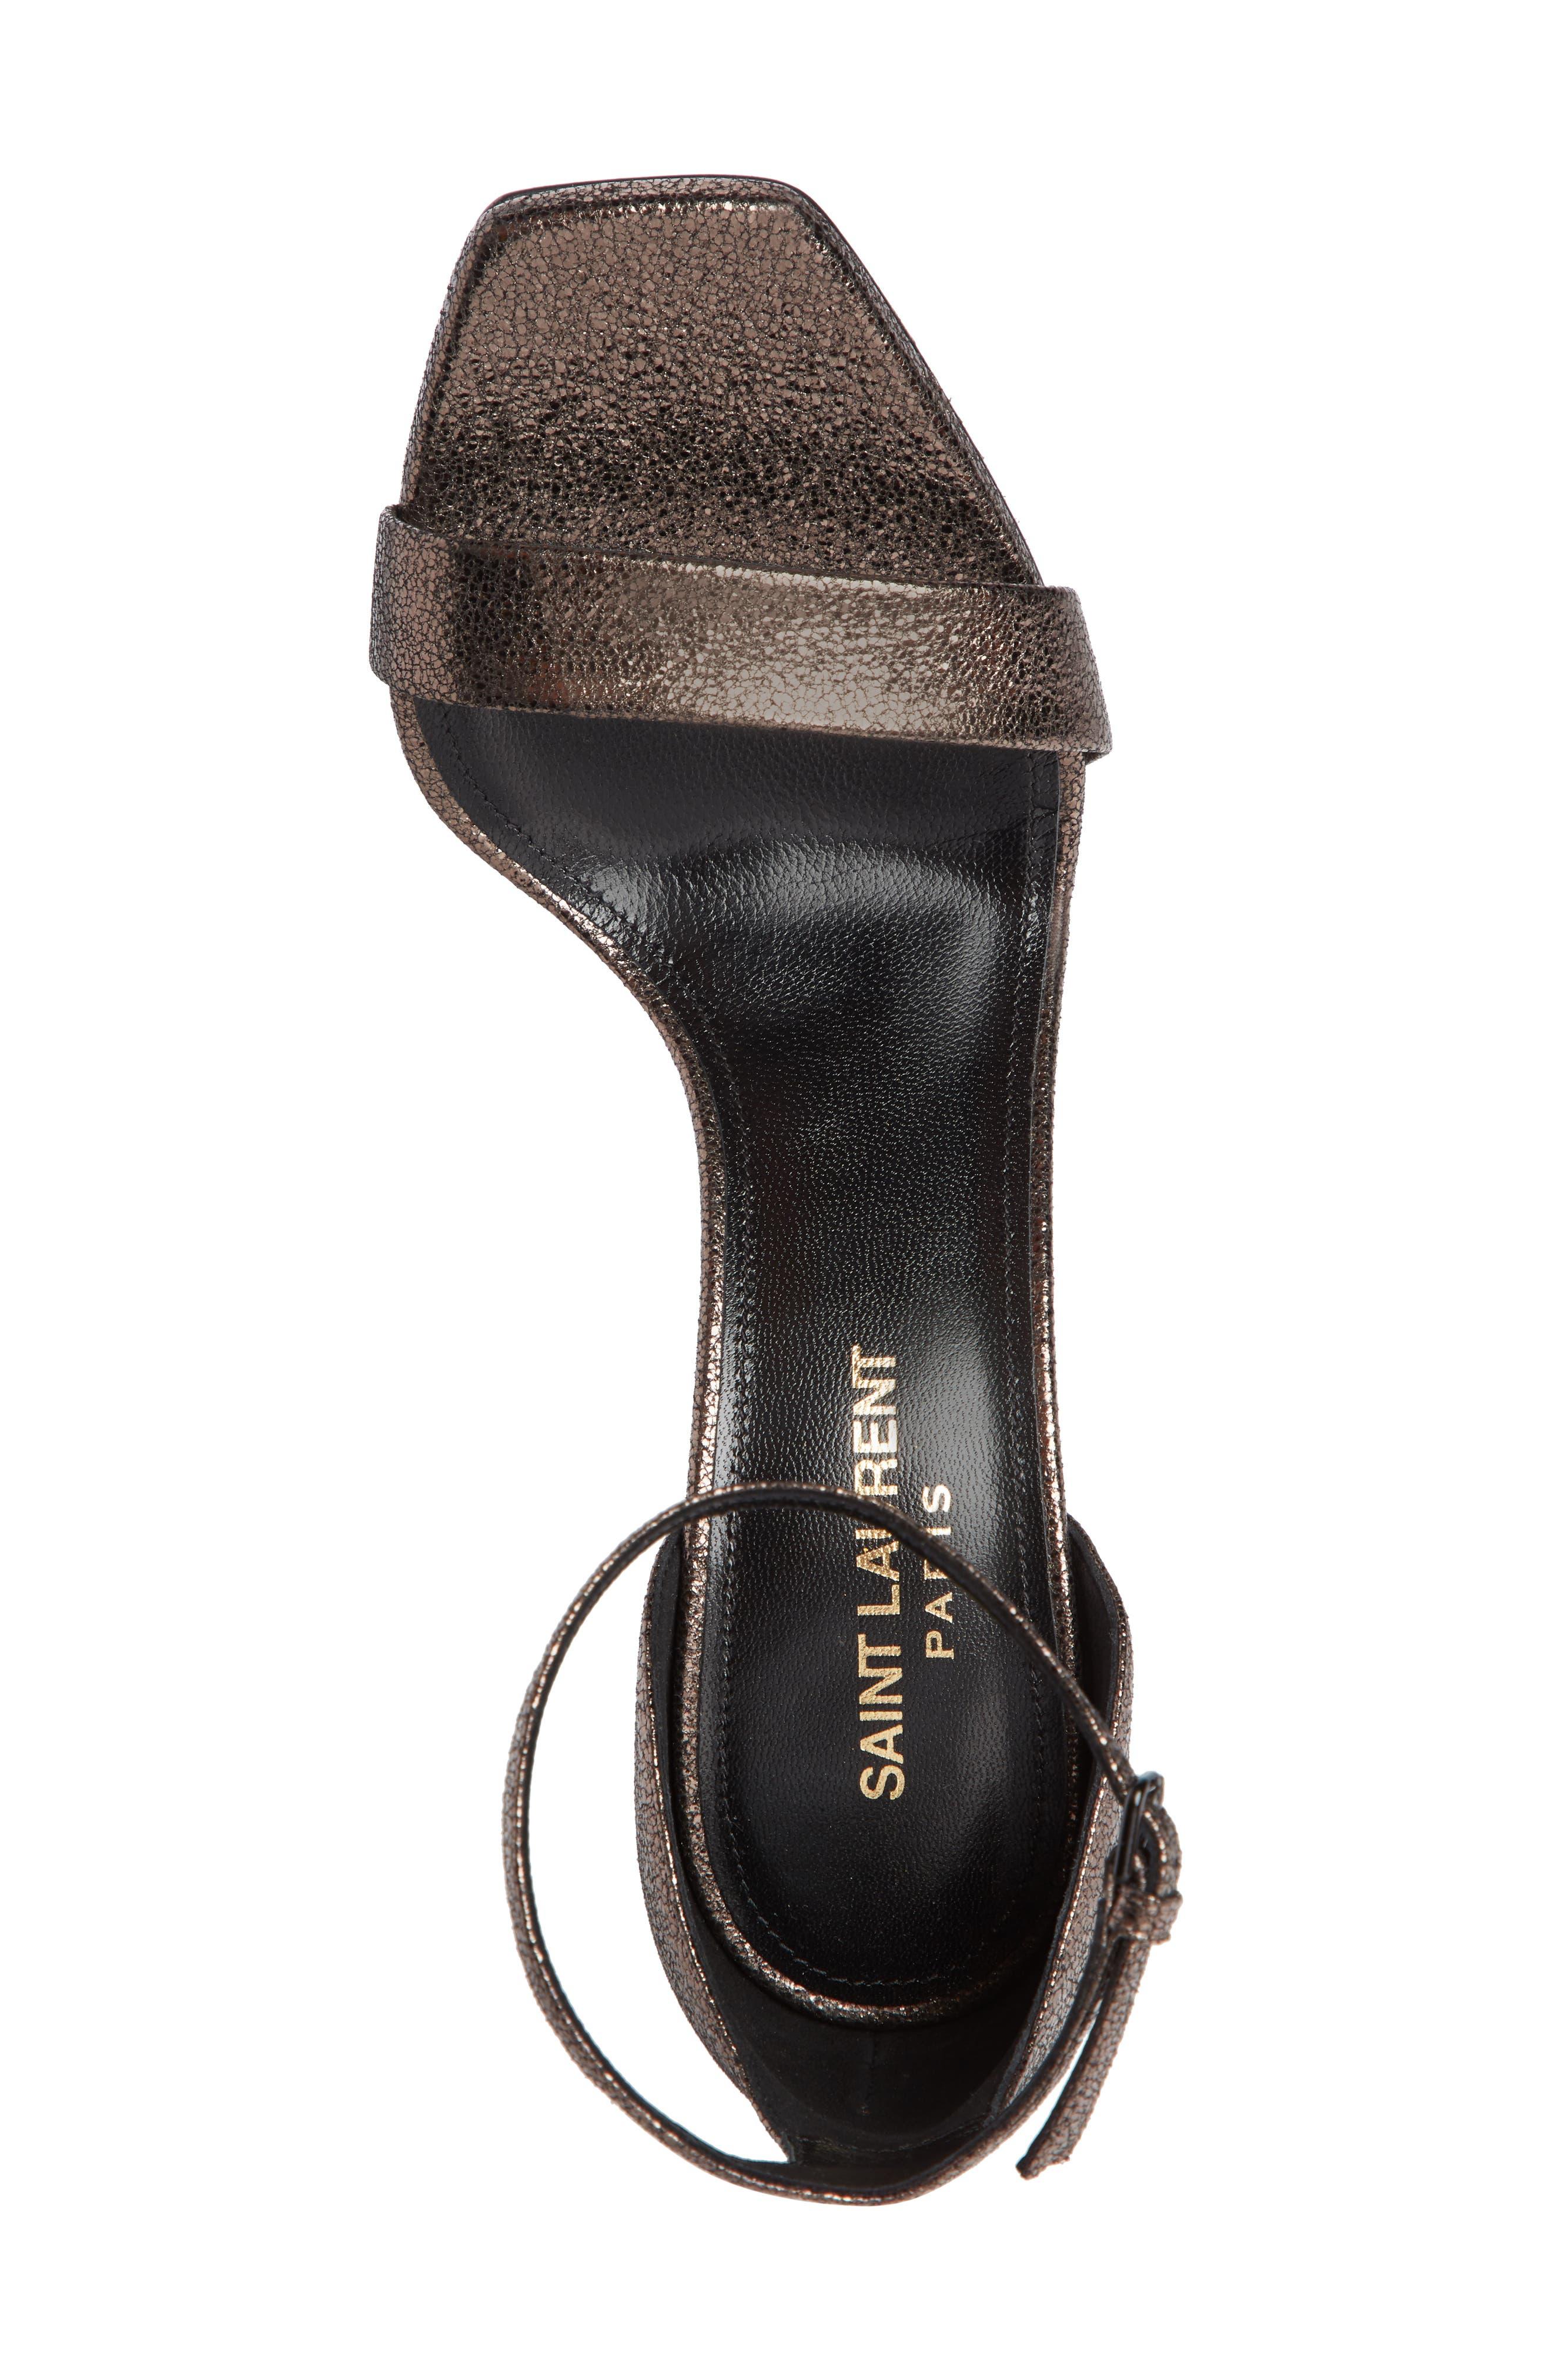 Amber Ankle Strap Sandal,                             Alternate thumbnail 4, color,                             BLACK/ METALLIC